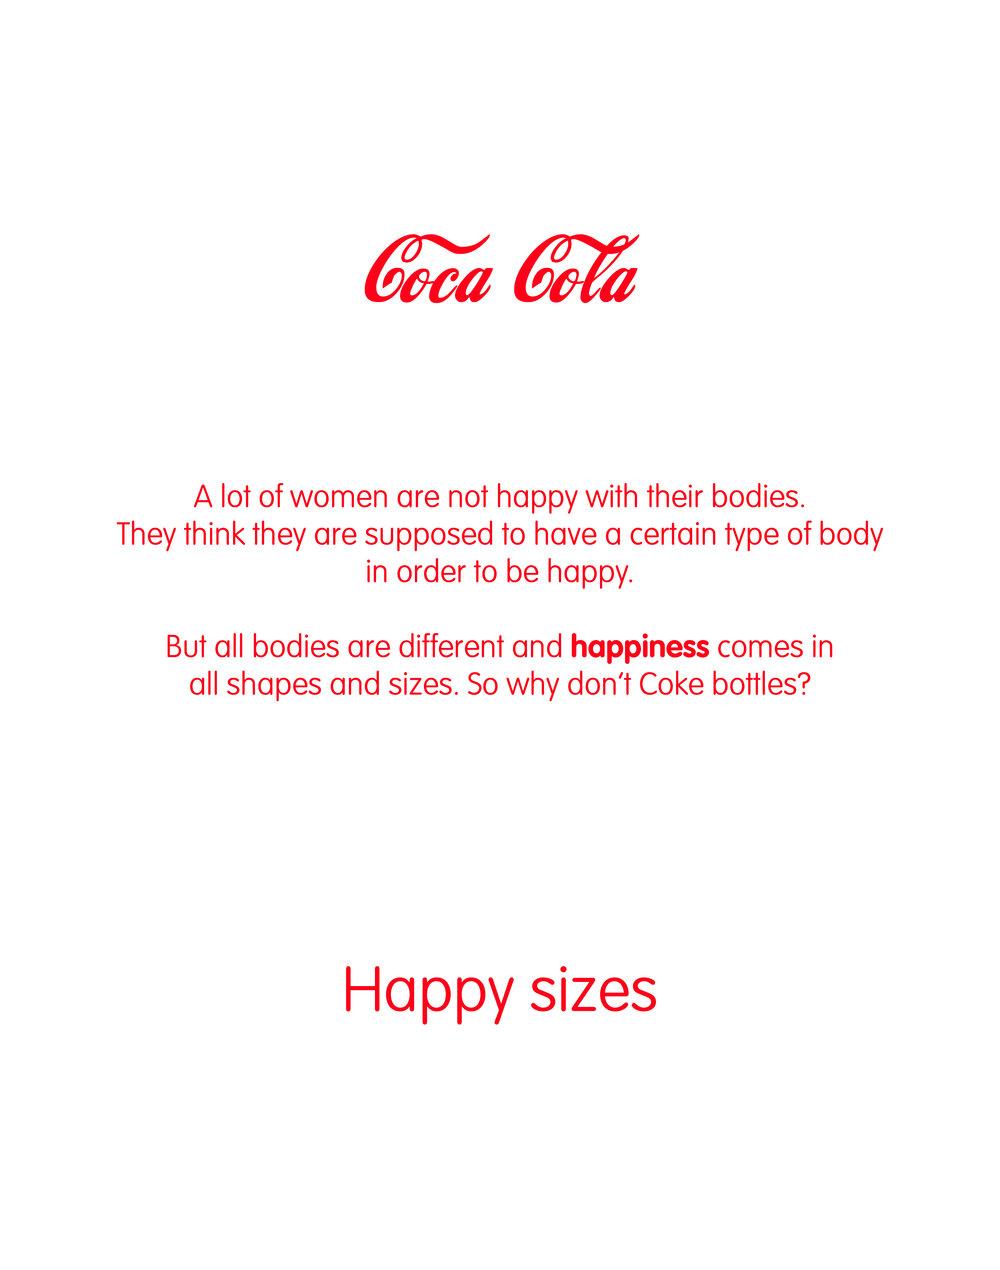 Cola_slide.jpg